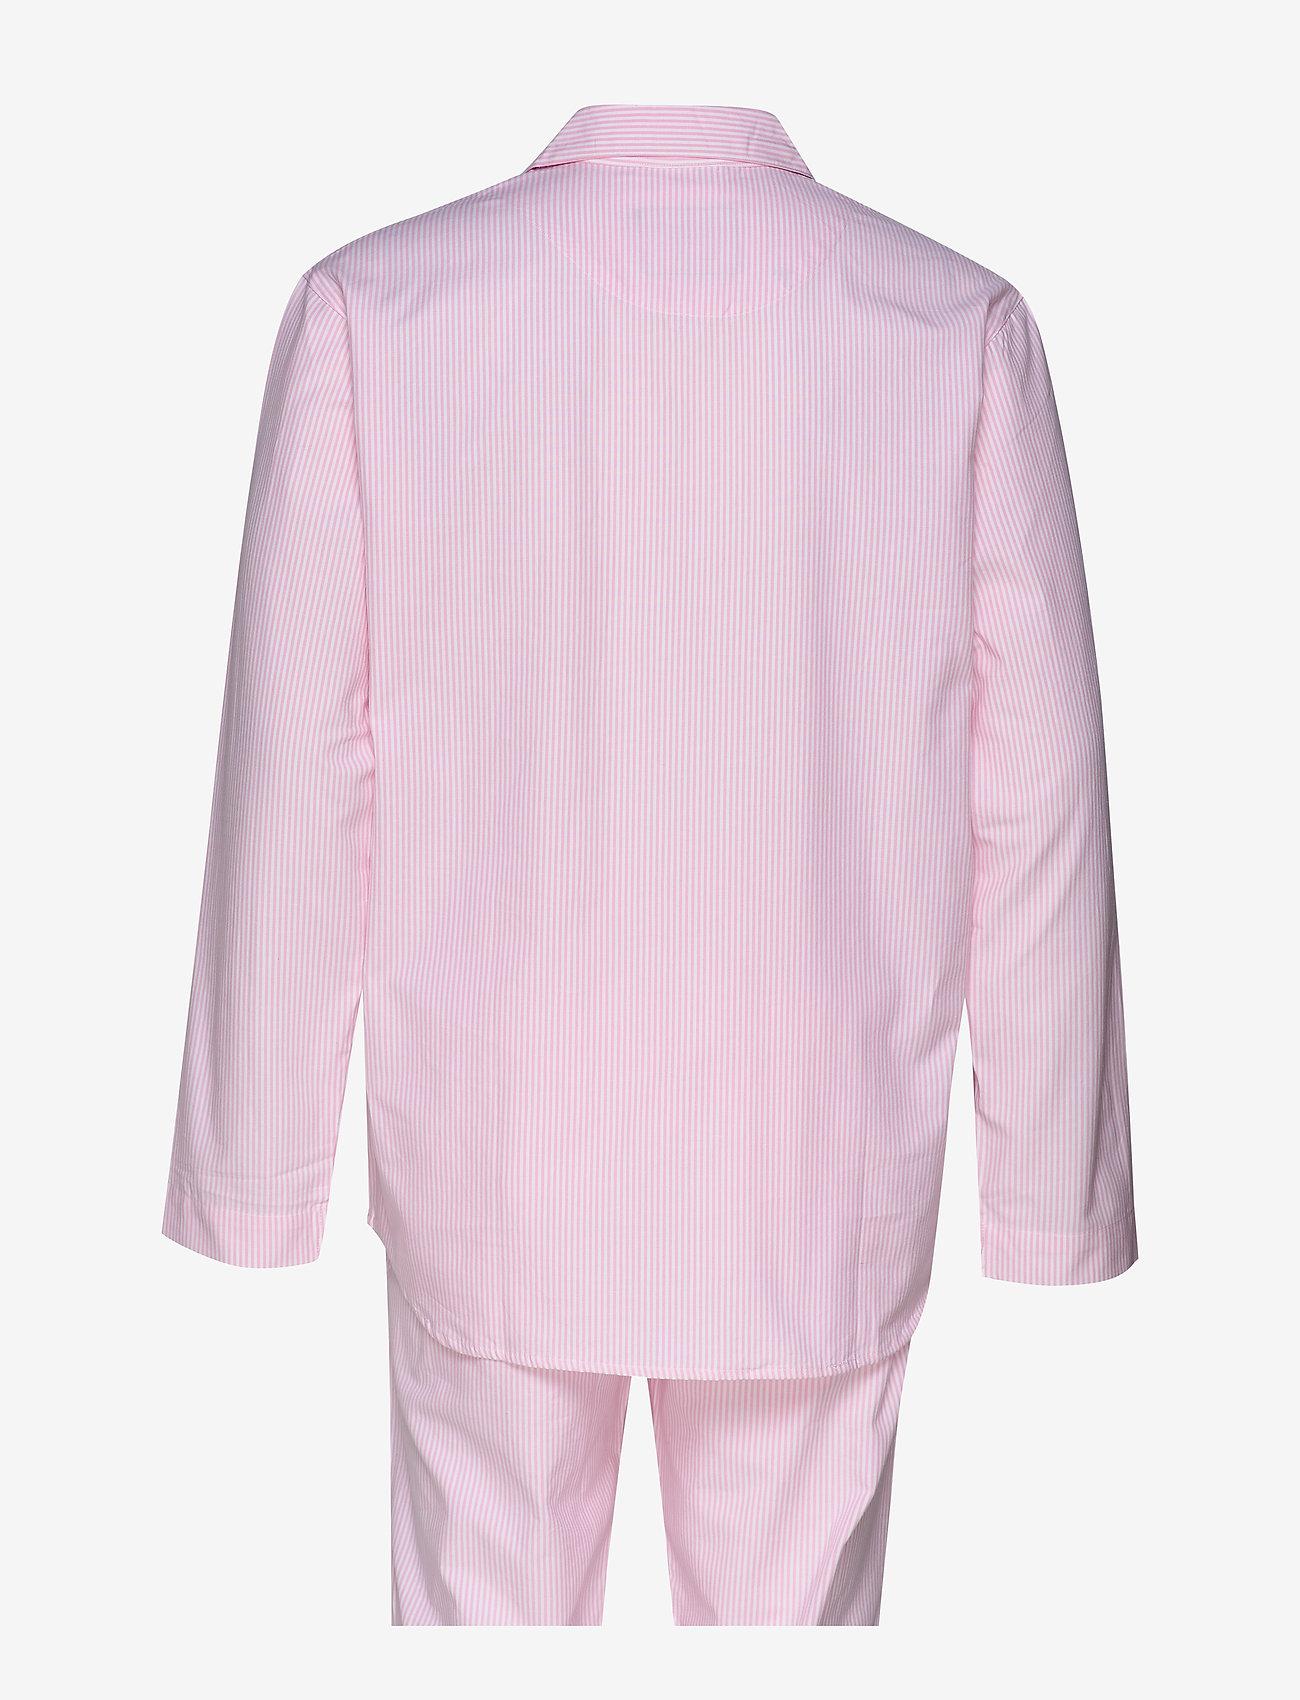 Lexington Home - Pajama Set organic - pyjamat - pink/white - 1